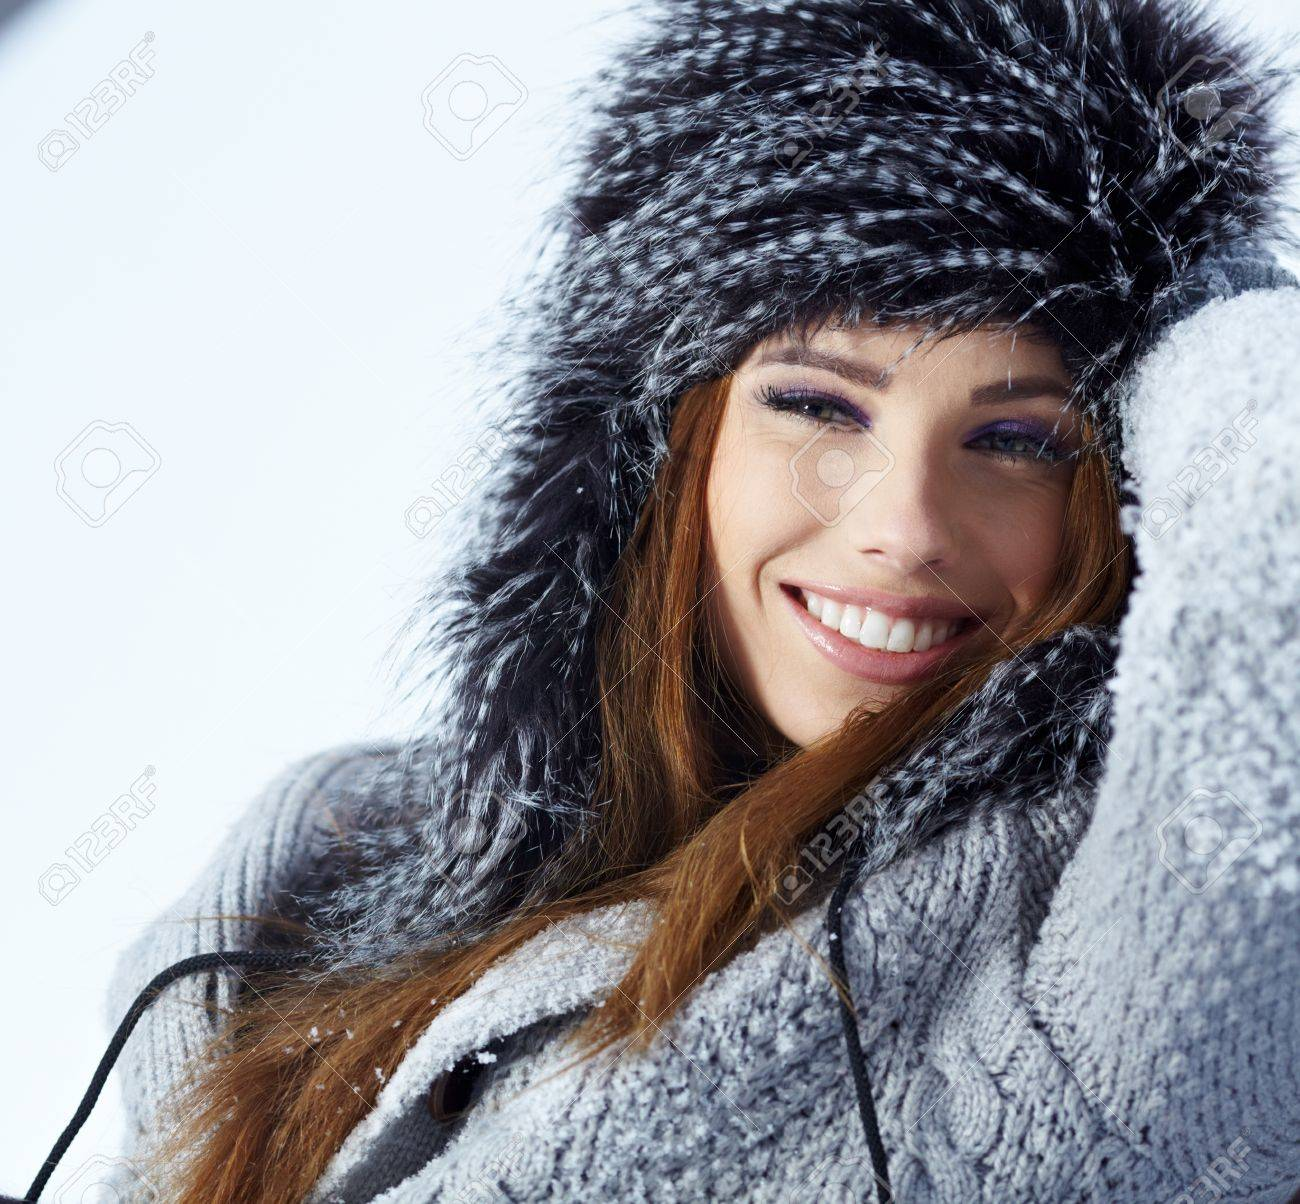 beautiful girl in winter park Stock Photo - 17255319